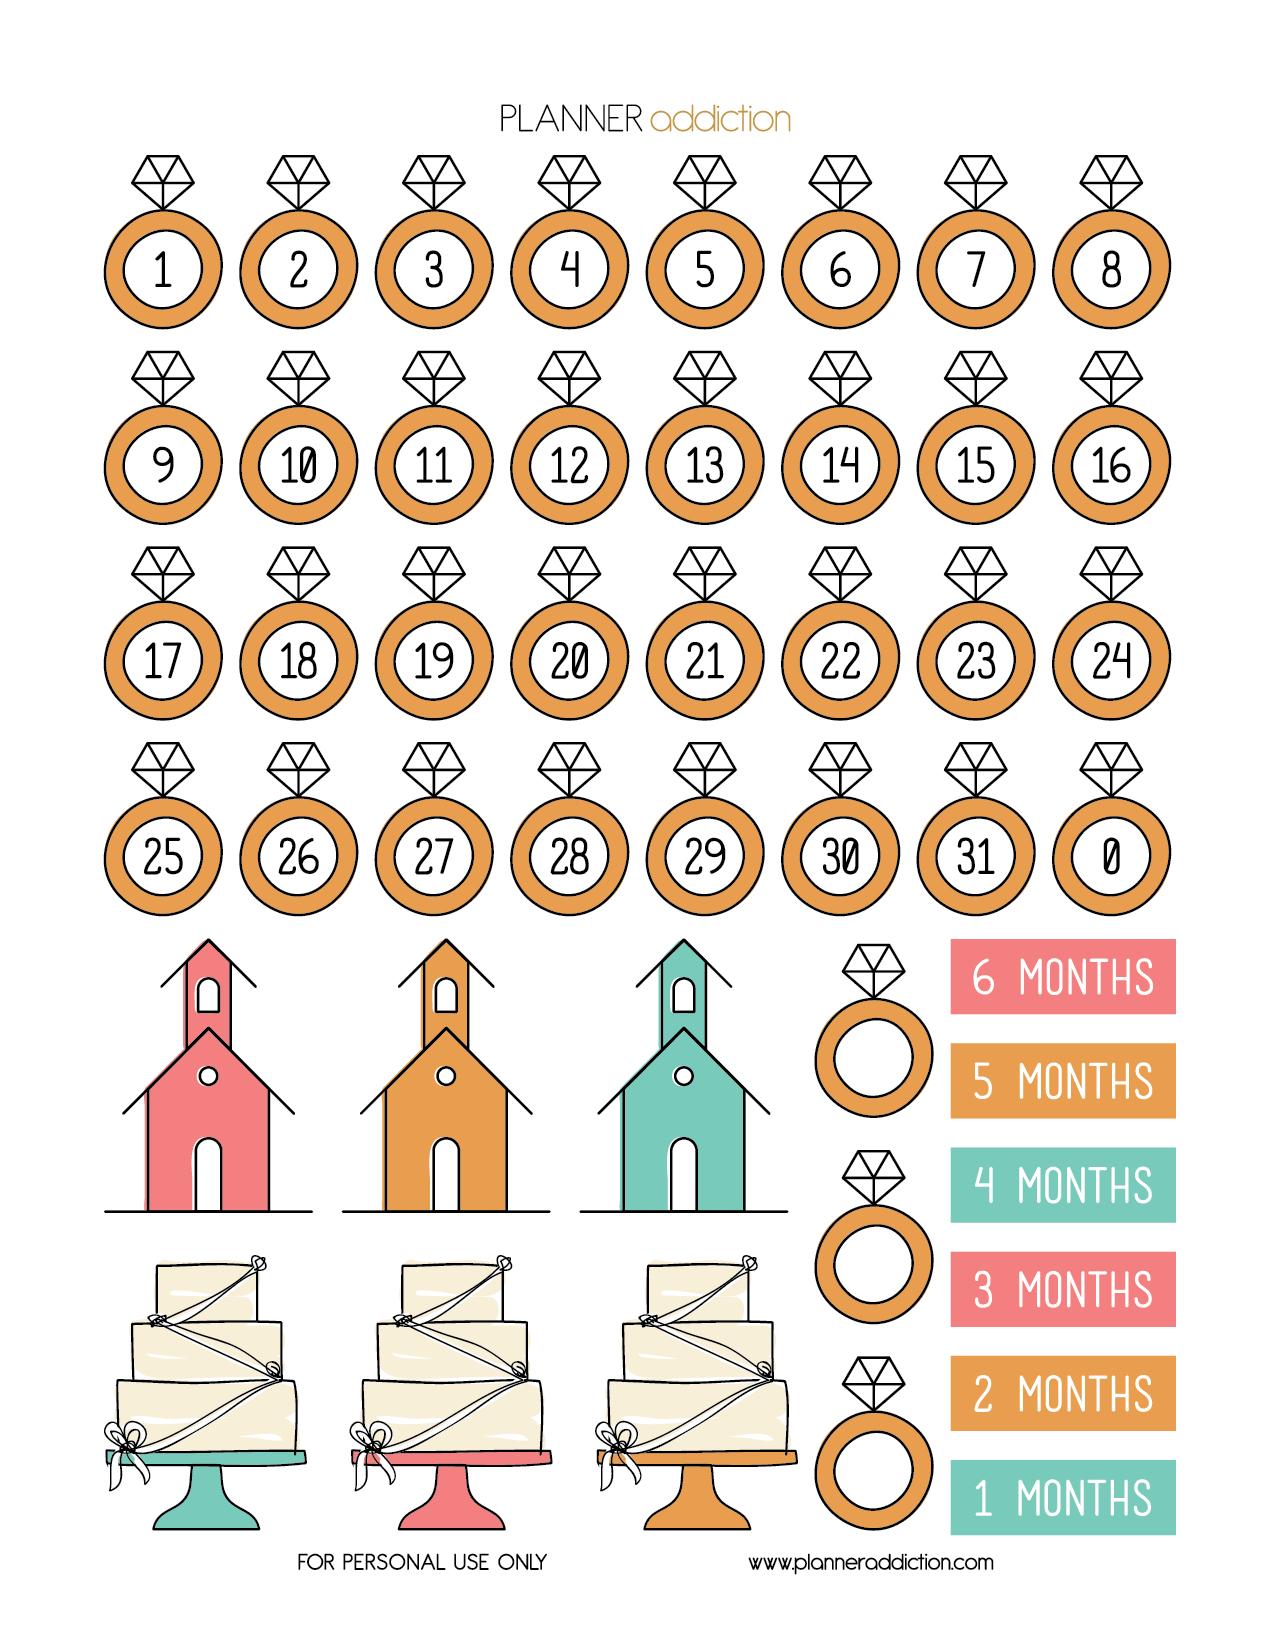 Wedding Countdown (Planner Addiction) - Free Printable Wedding Countdown